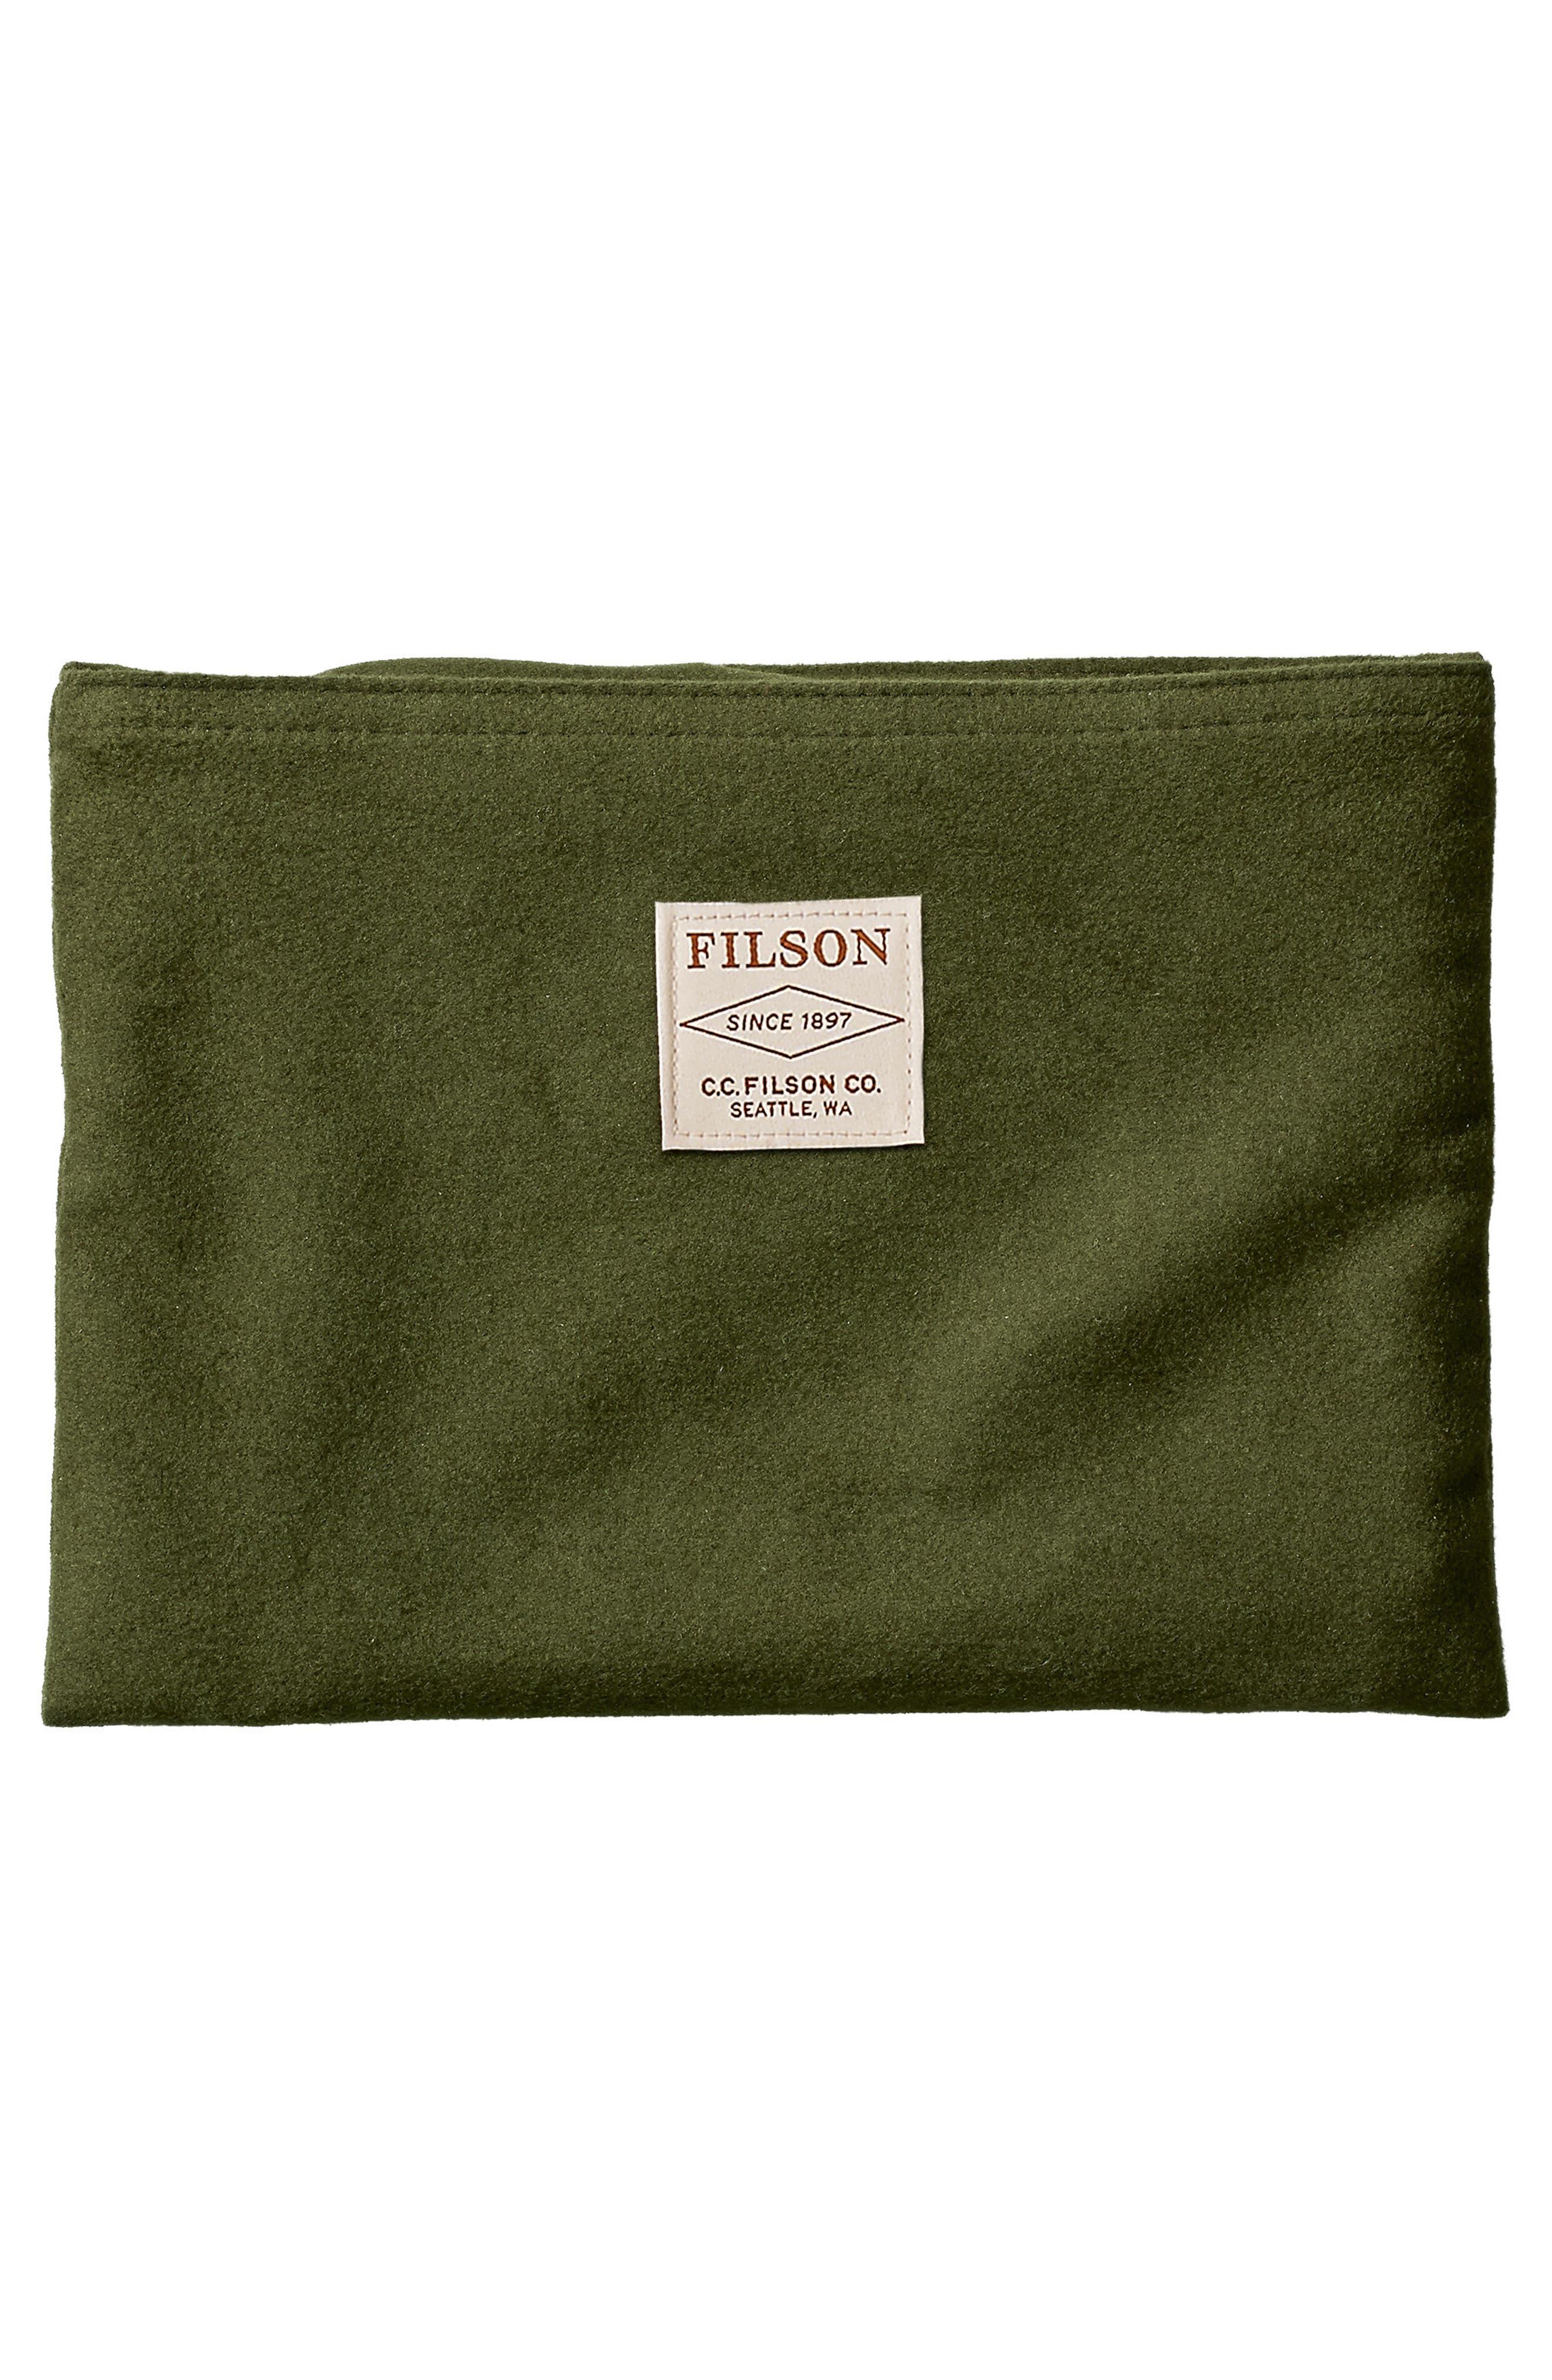 Medium Leather Zipper Pouch,                             Alternate thumbnail 2, color,                             Moss